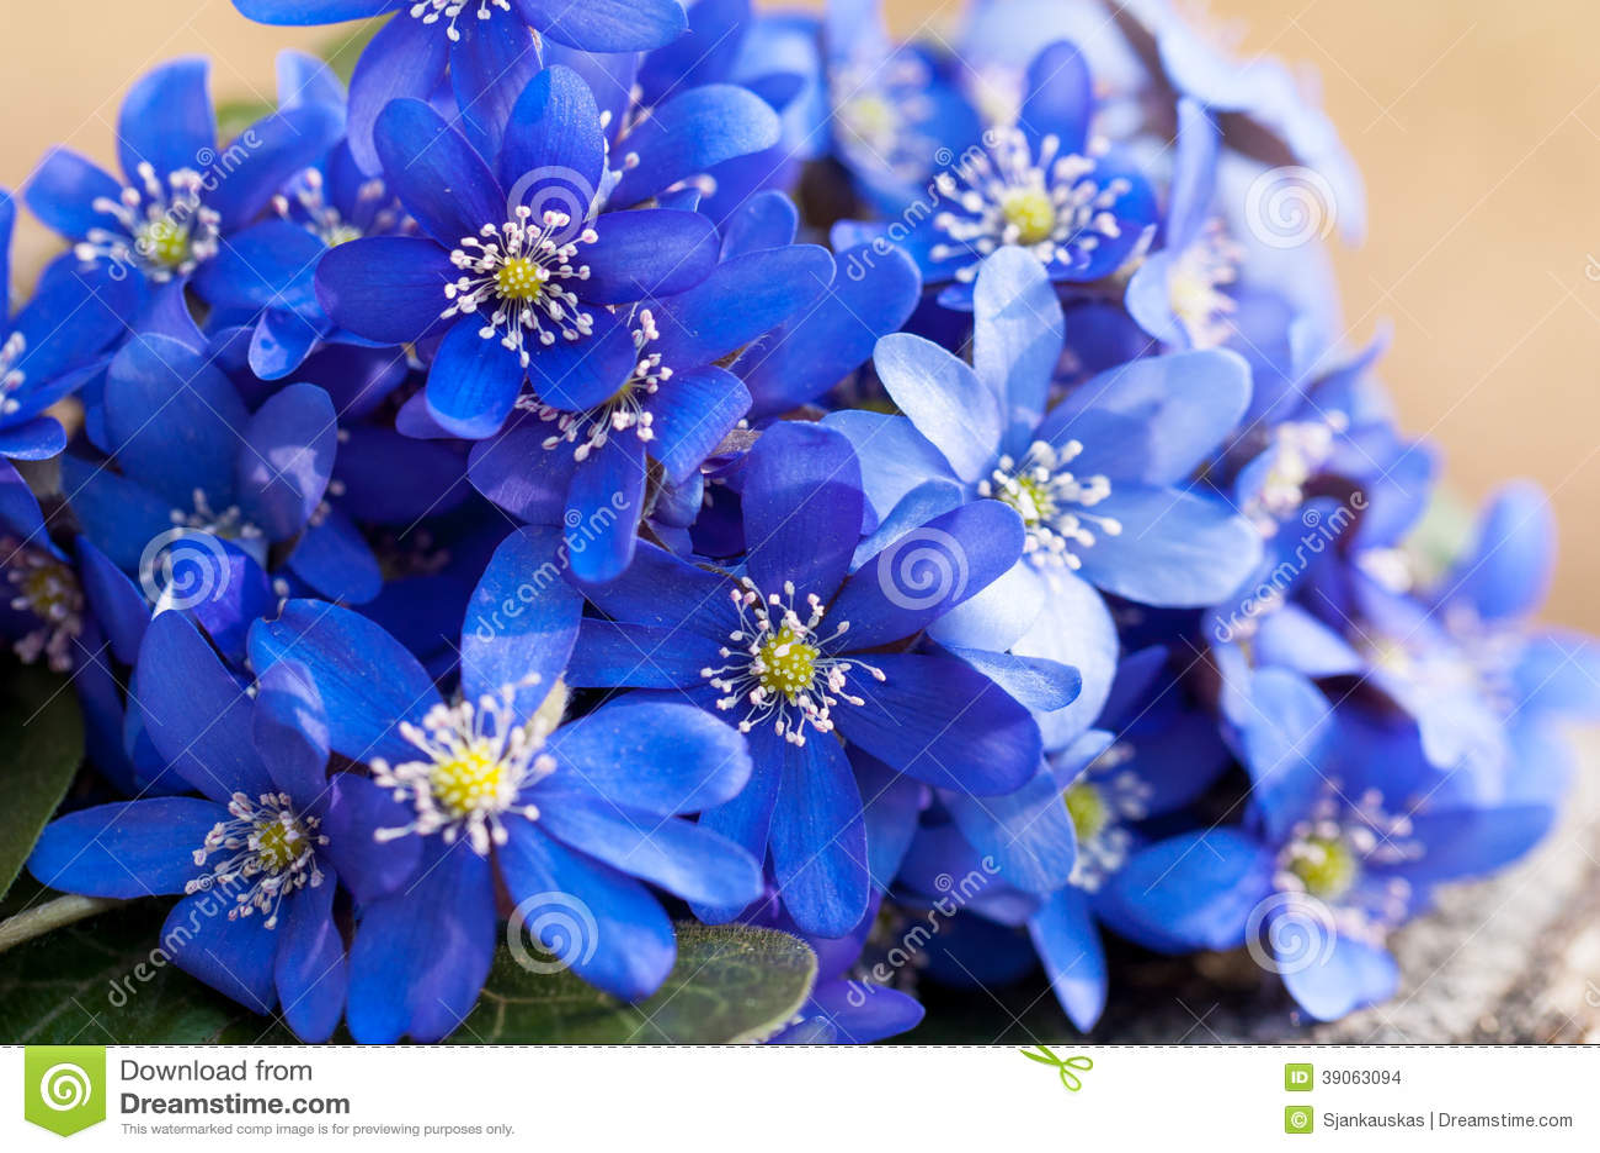 Wild Violets Bouquet Stock Photo - Image: 39063094